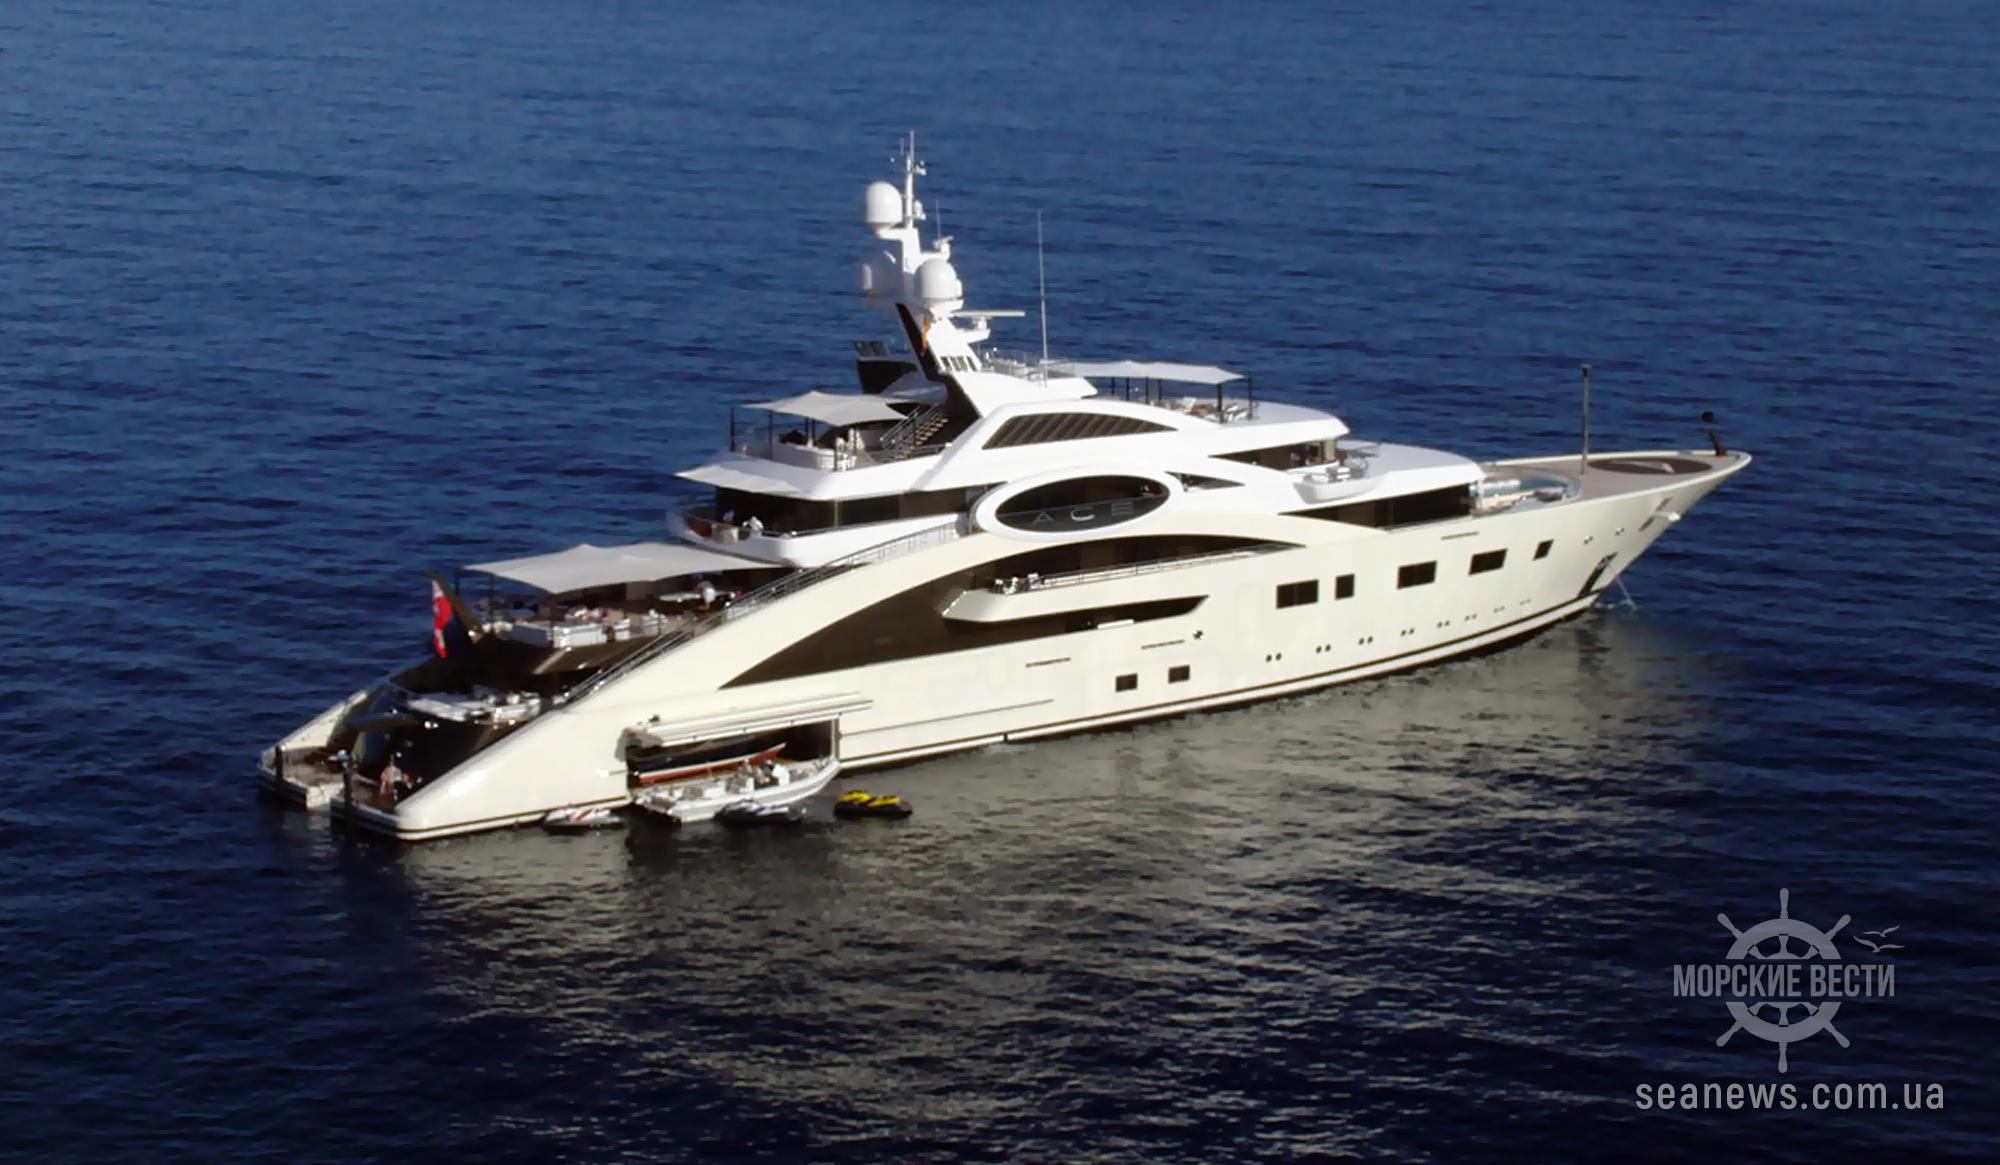 Украинский миллиардер продает яхту за €119 млн